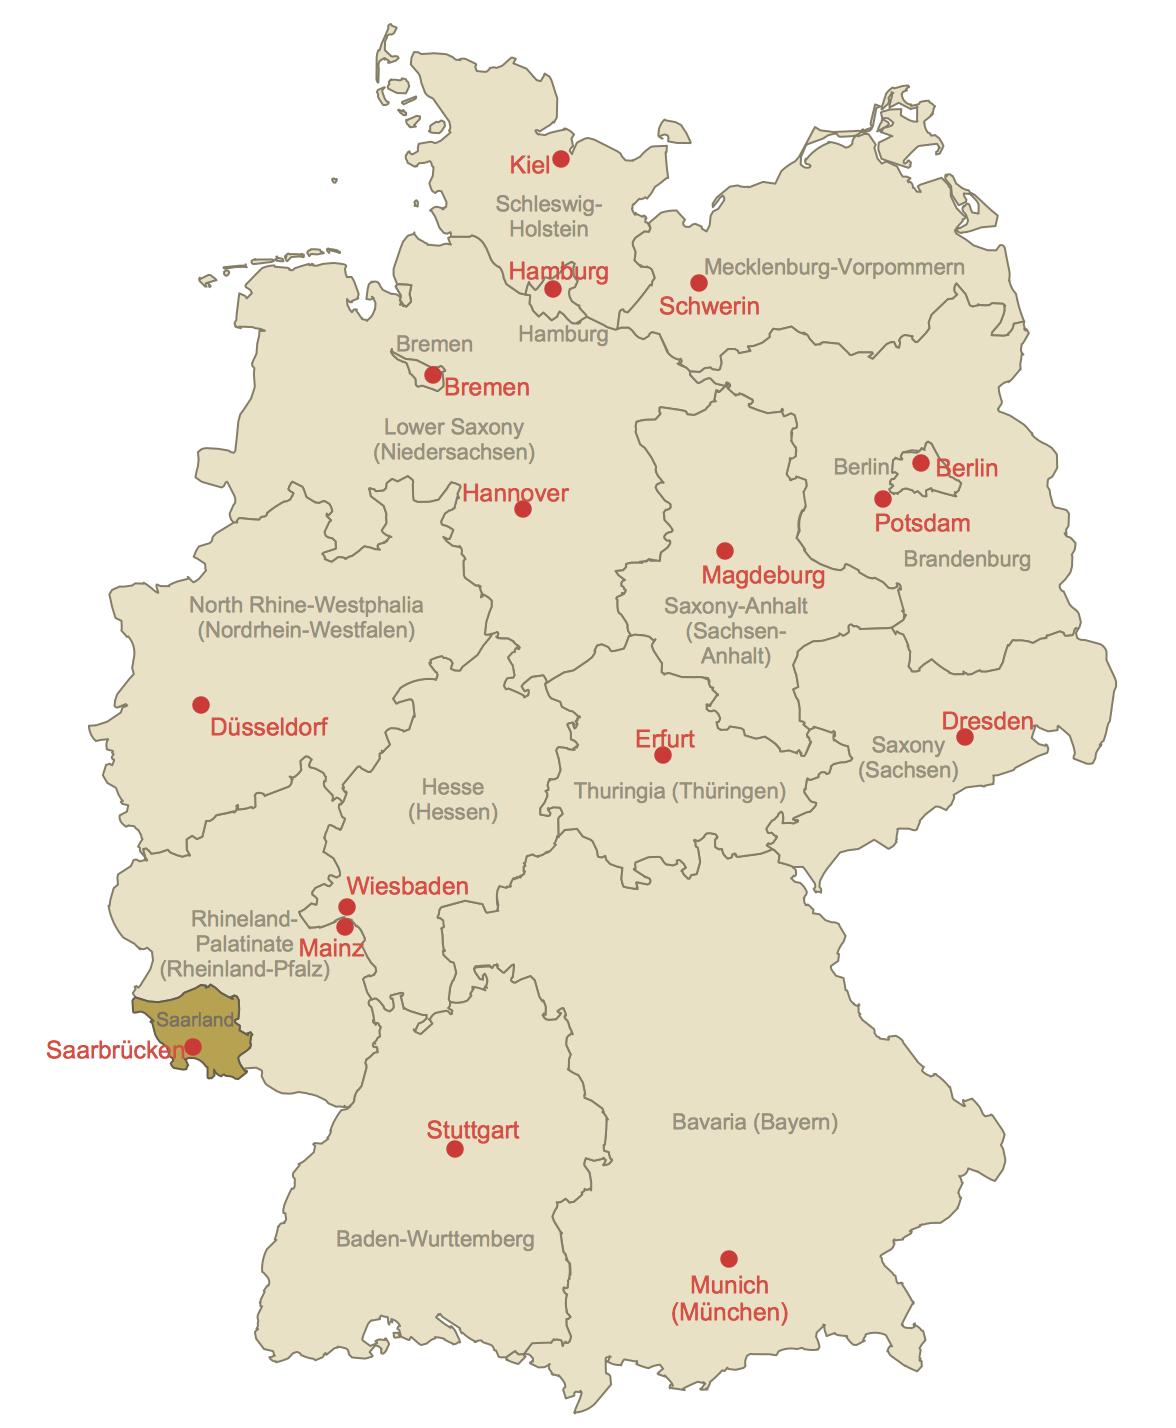 Locator Map of Saarland